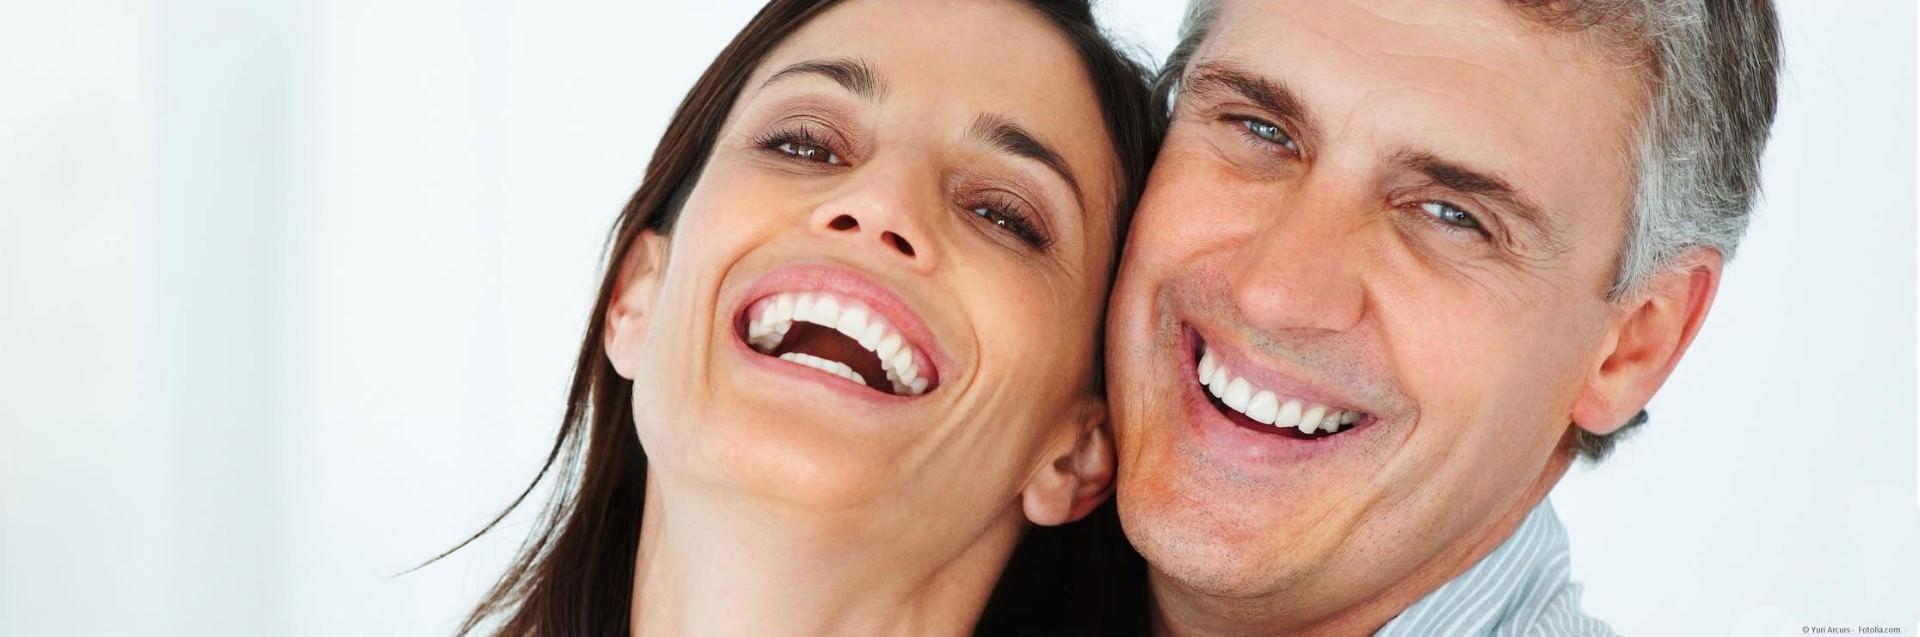 Zahn-Implantate in Eichenau